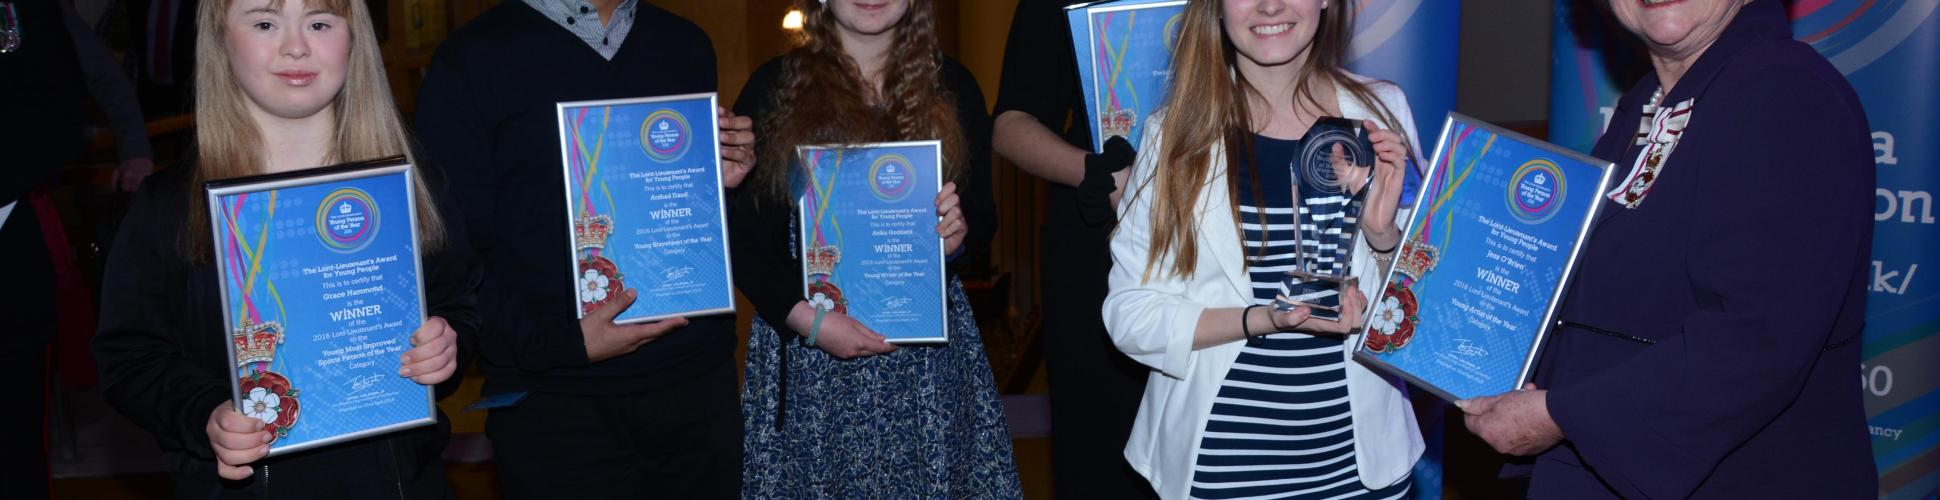 2016 Lord Lieutenant Award winners